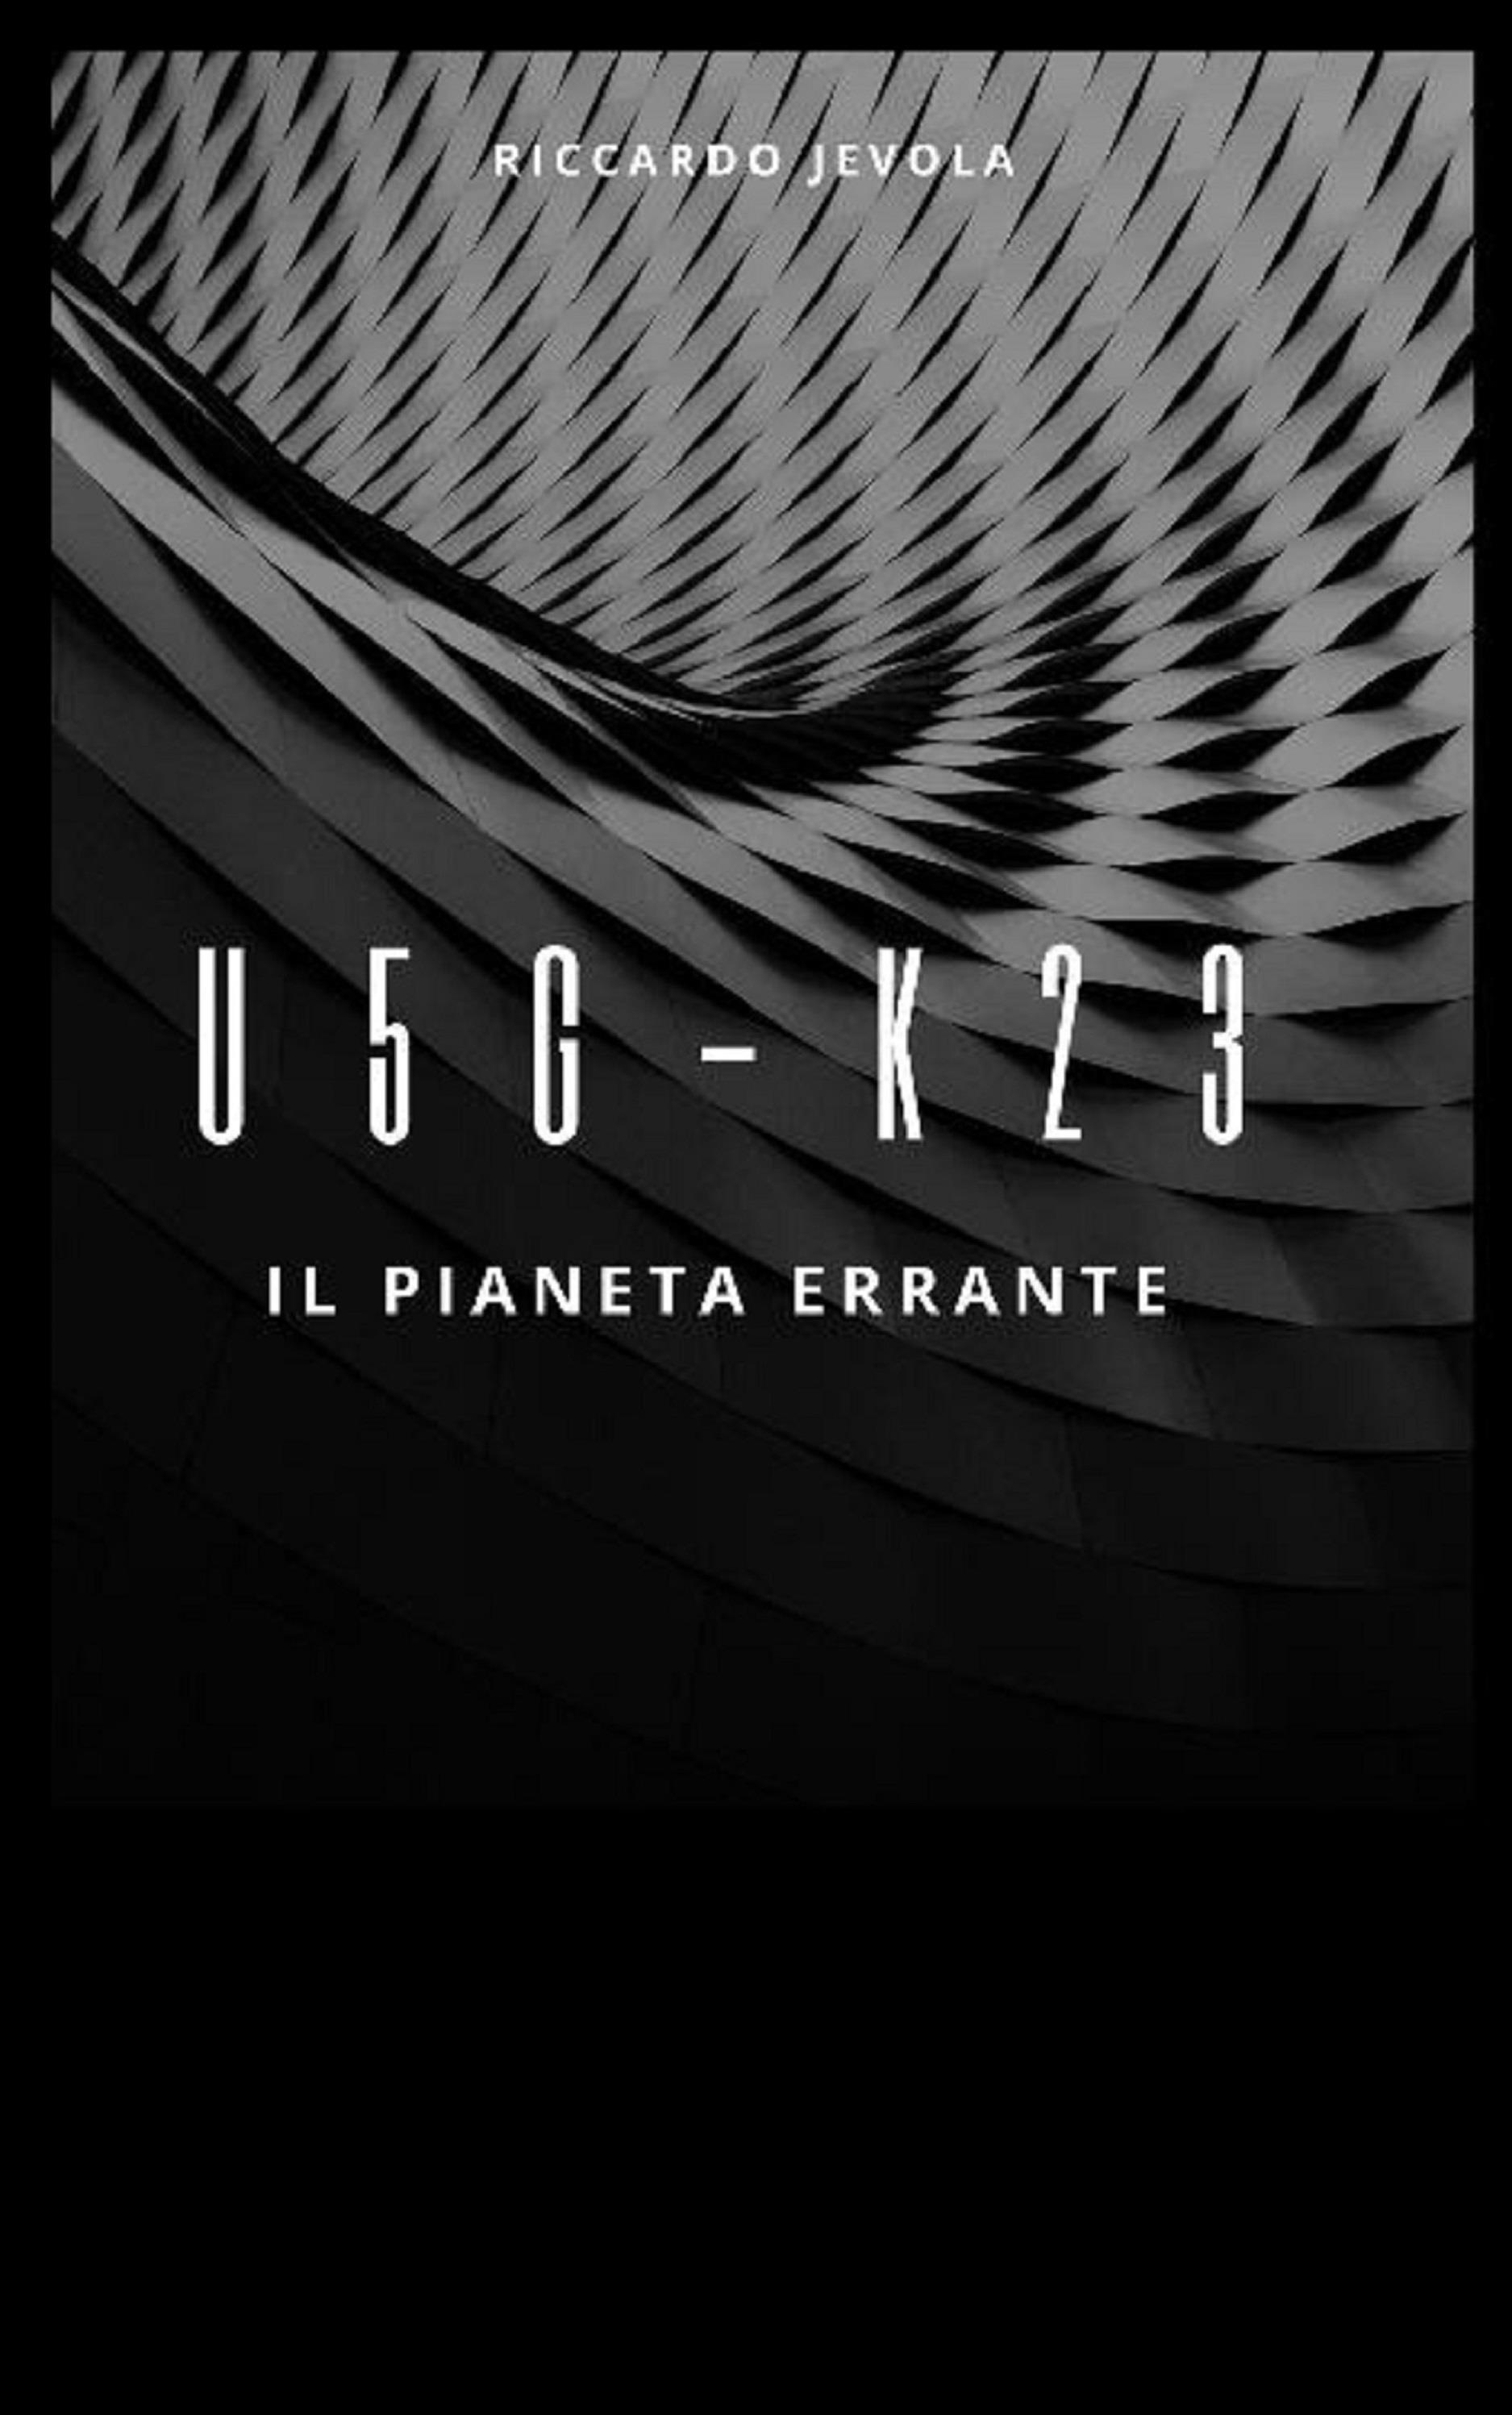 U5G-K23